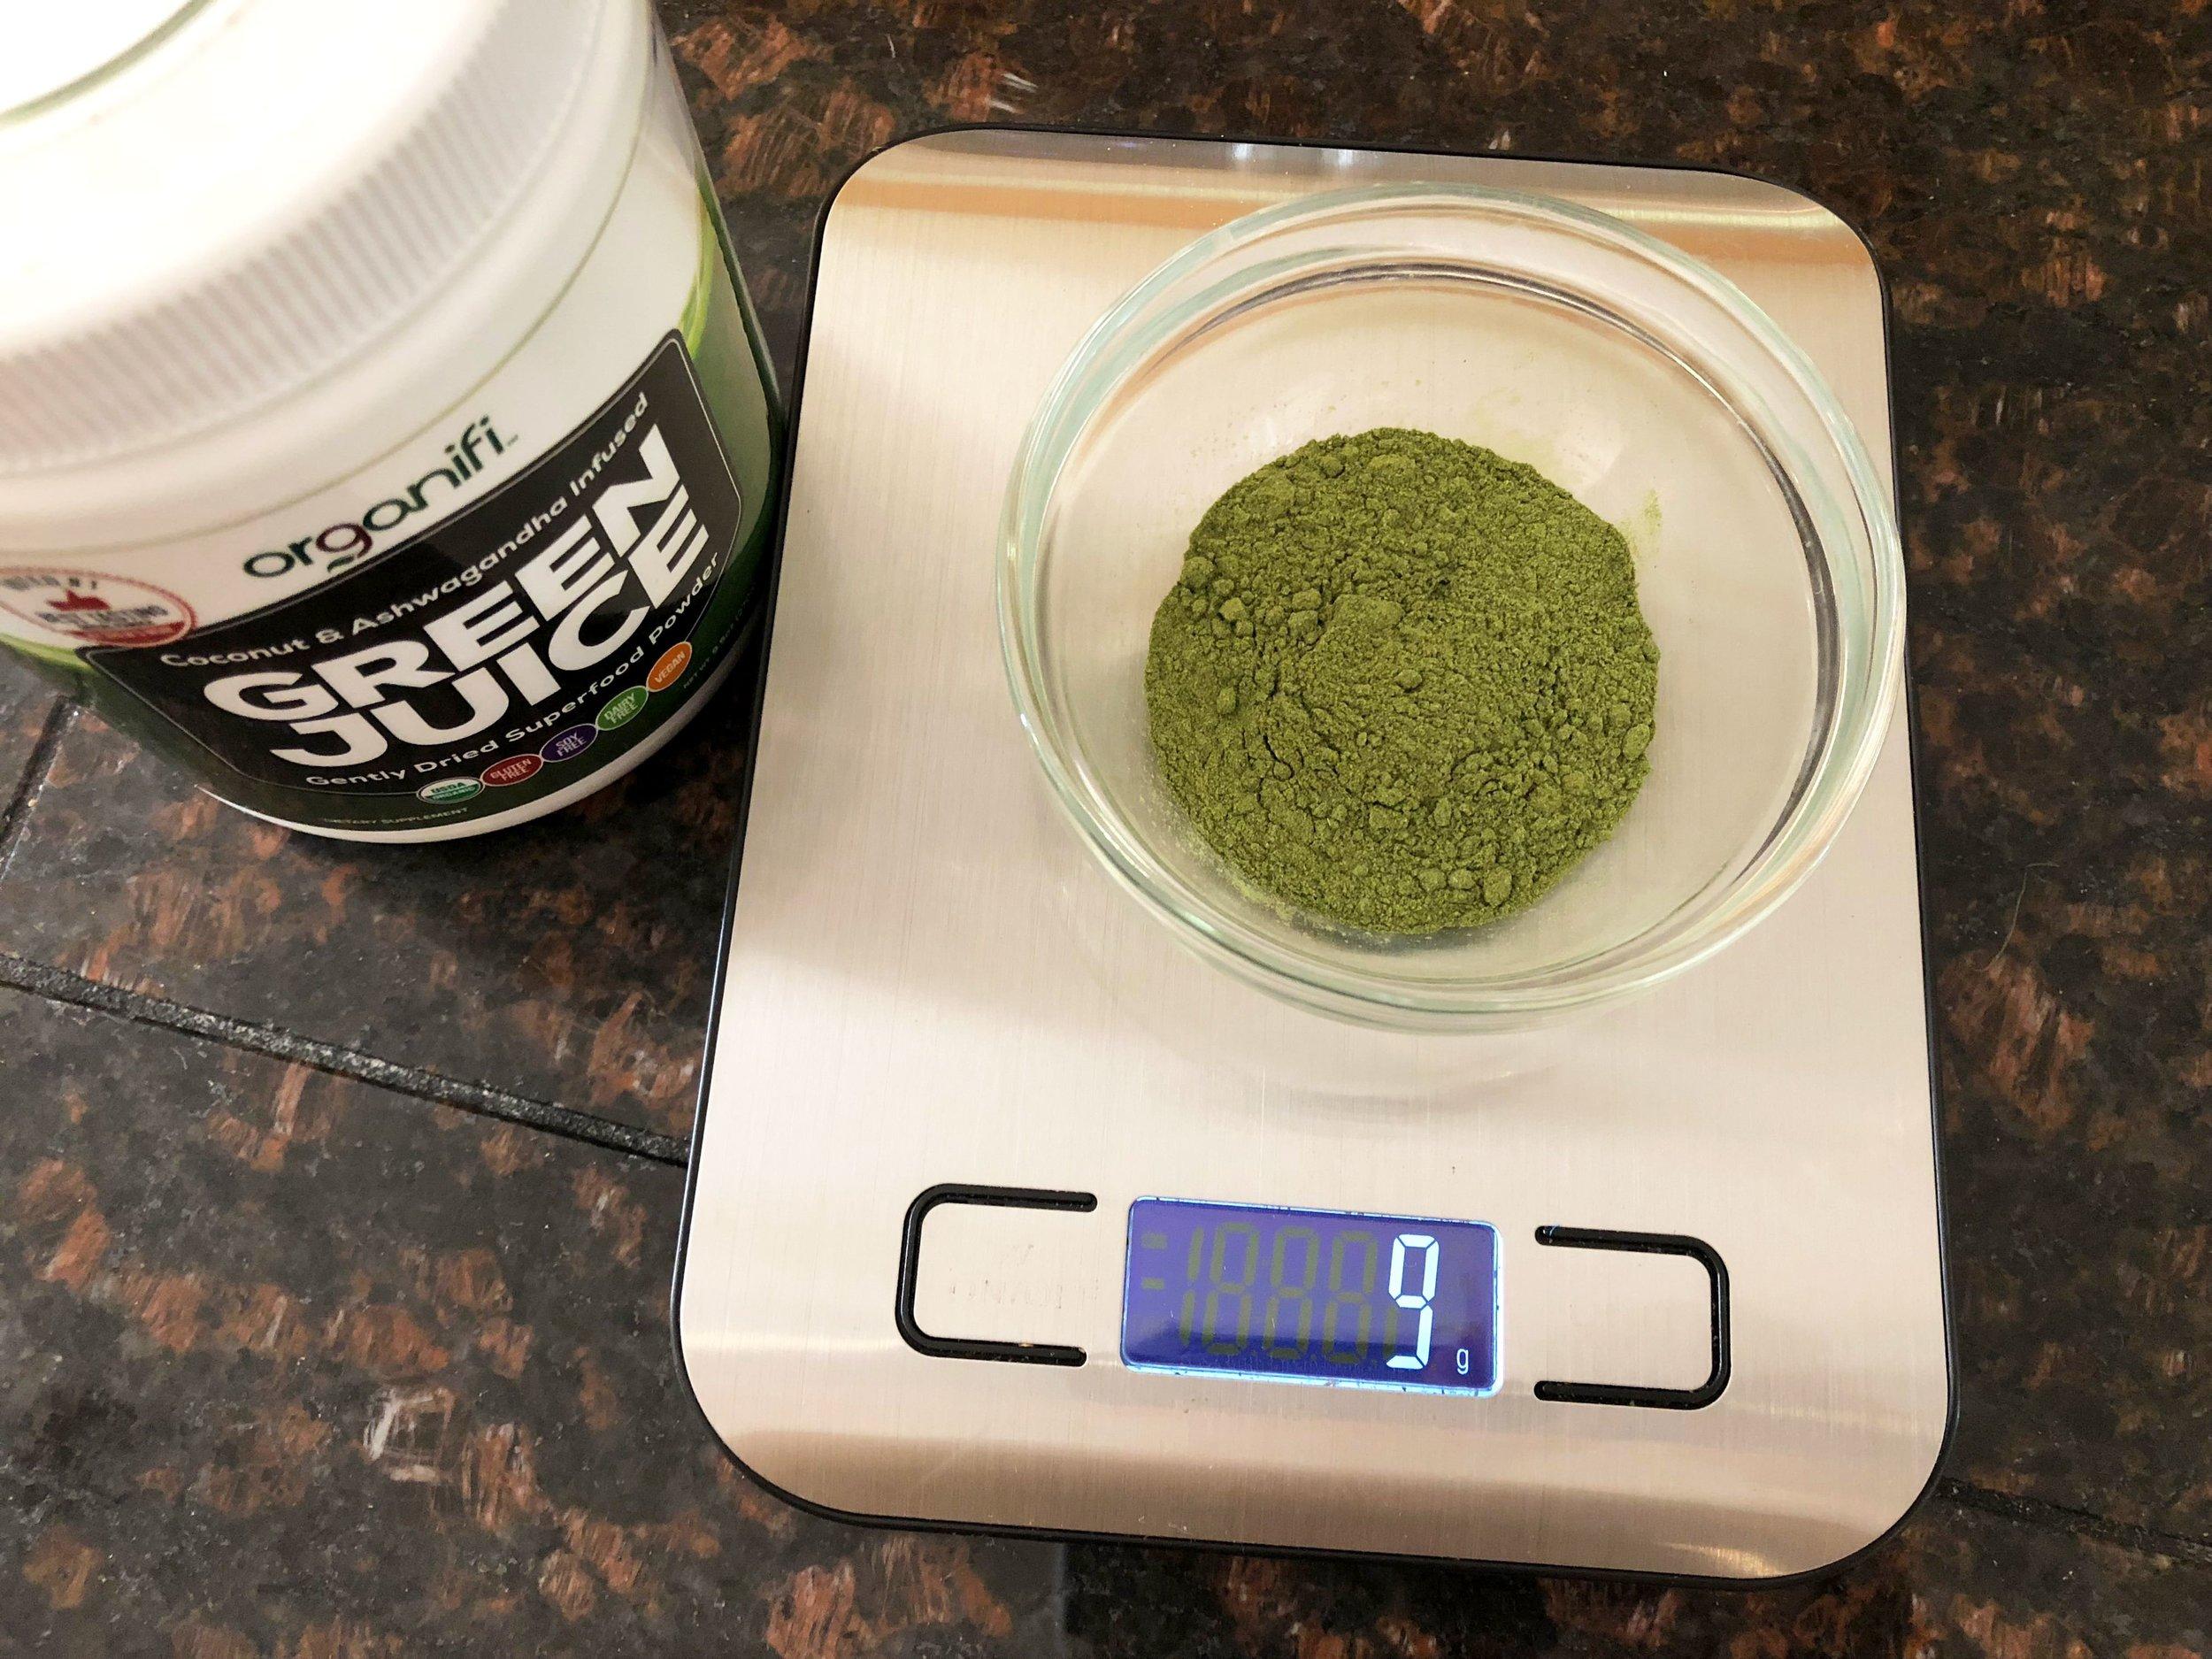 A Scoop of Green Juice Weighs to Nine Grams